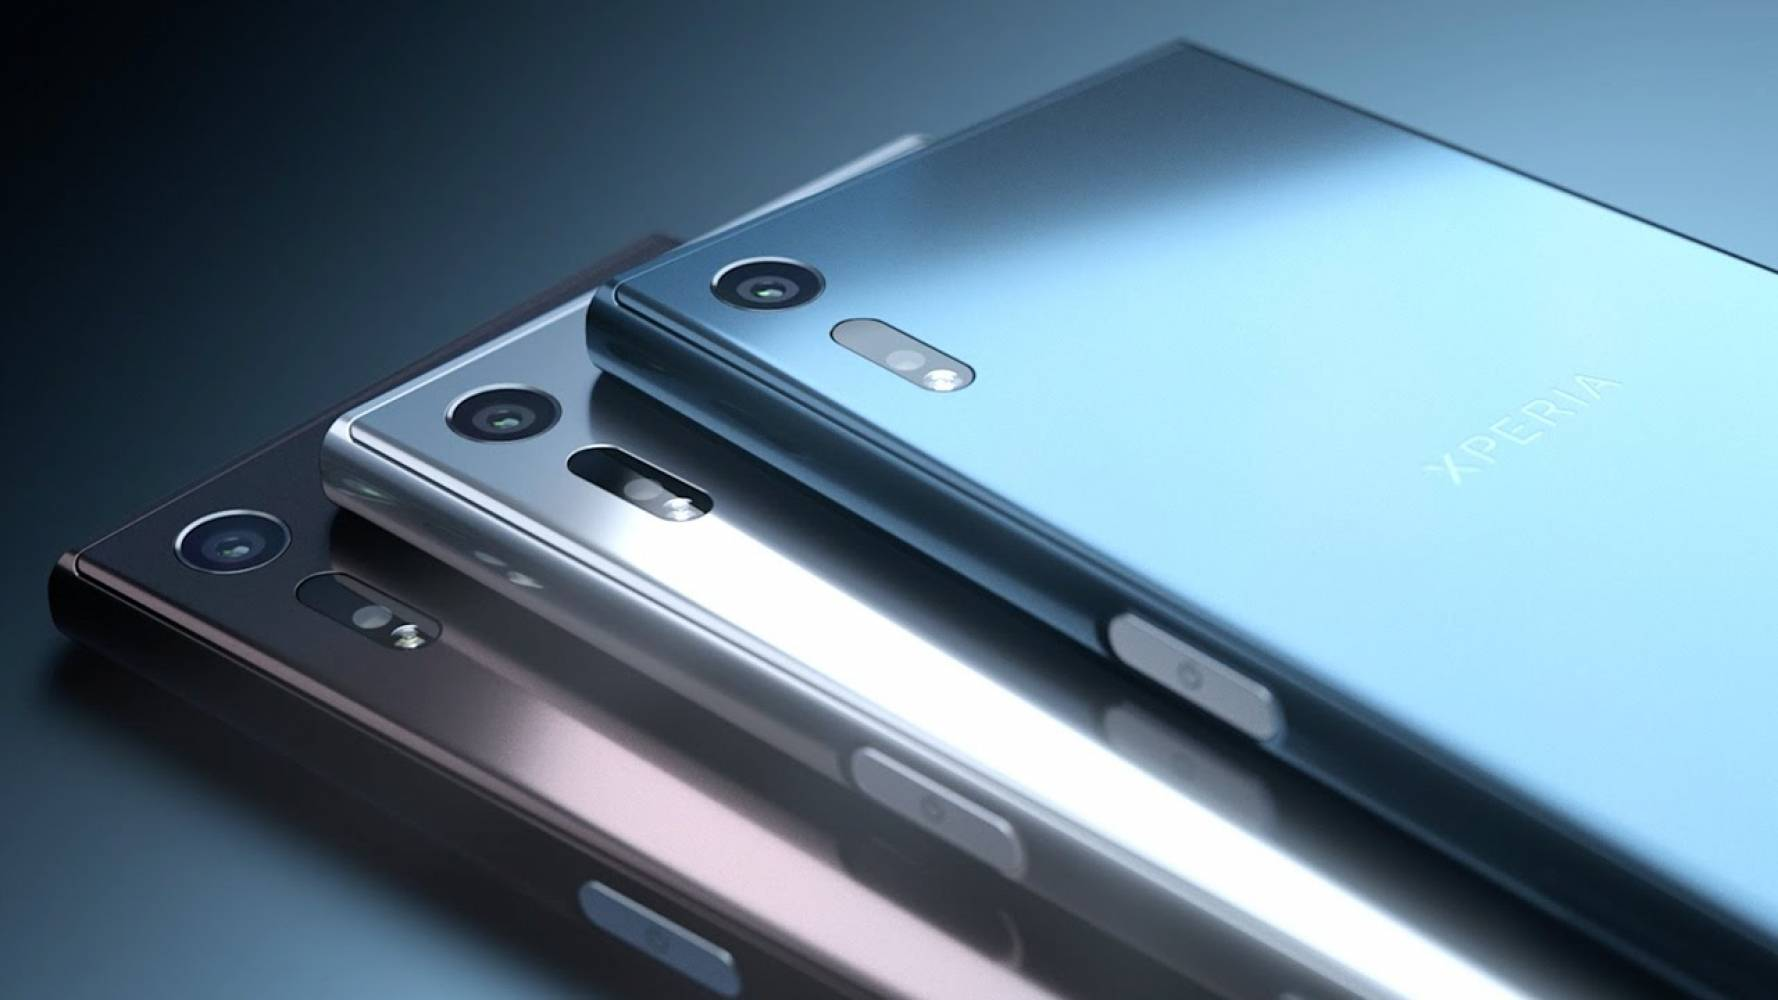 Sony Xperia XZ Premium е 4К флагман, който идва през май